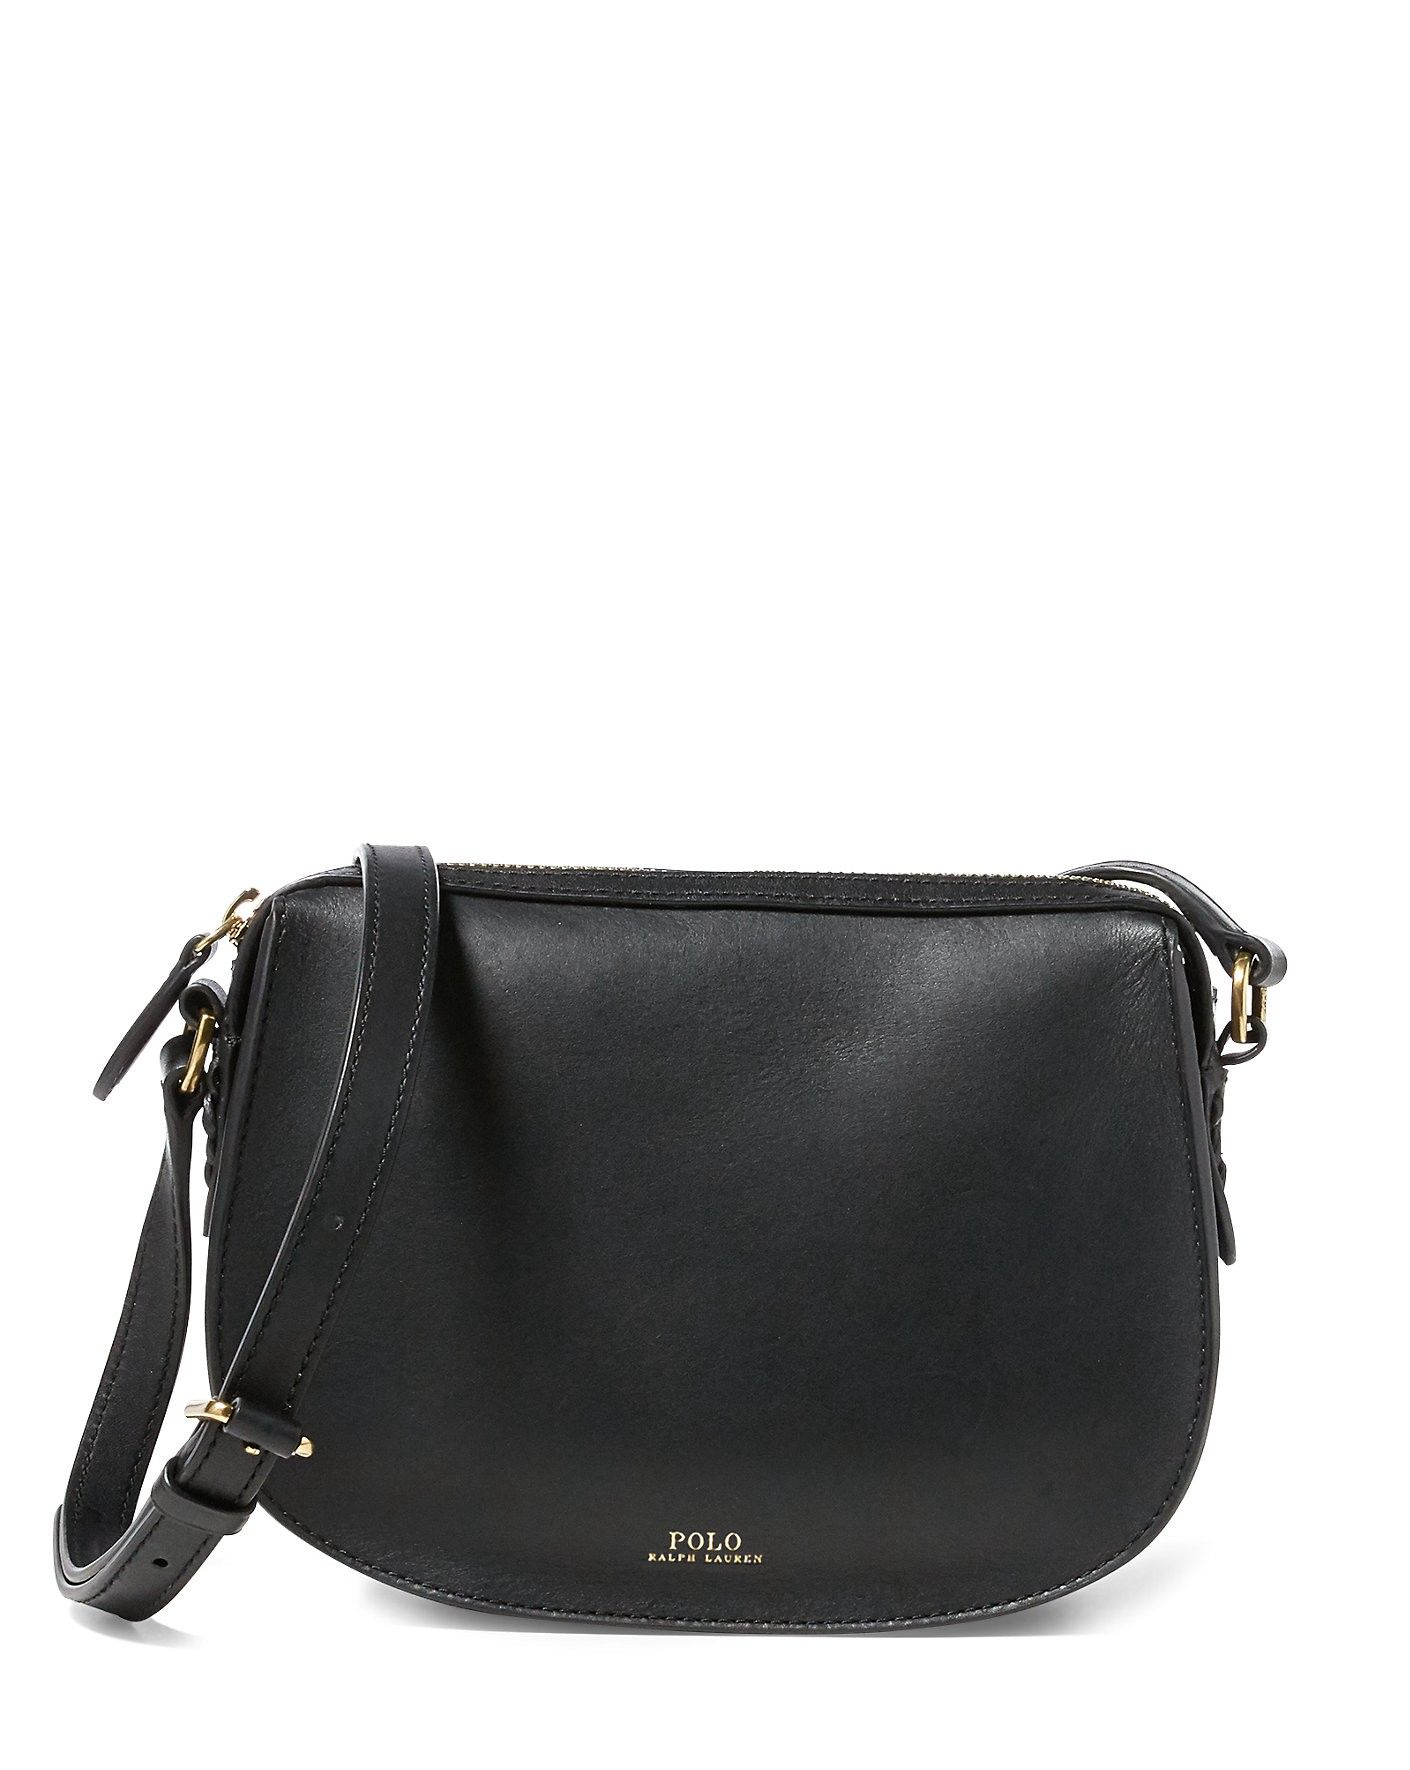 0db13702080d RALPH LAUREN Leather Mini Crossbody Bag.  ralphlauren  bags  shoulder bags   leather  crossbody  cotton